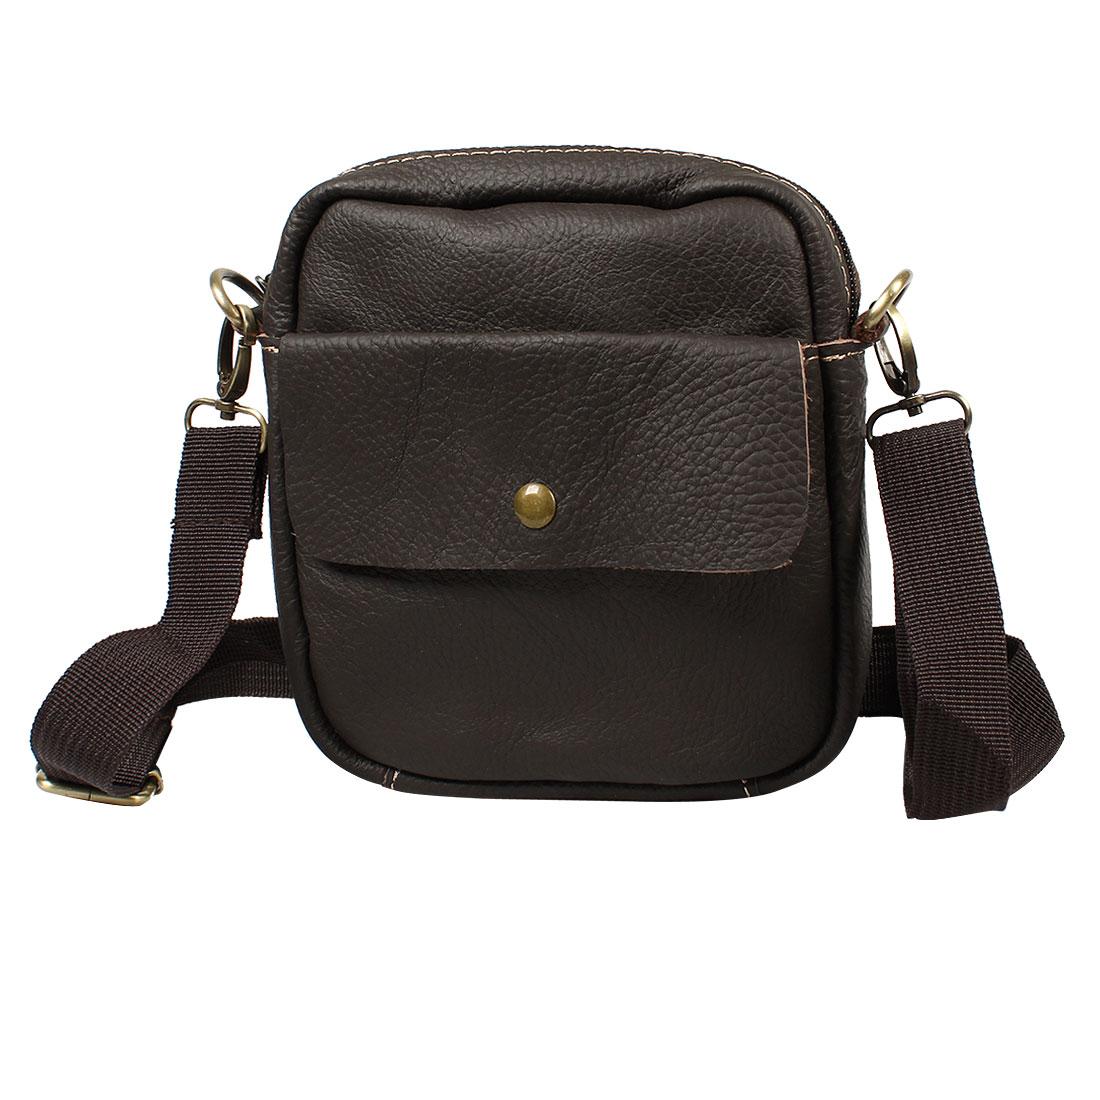 Adjustable Shoulder Strap Coffee Color Faux Leather Zipper Bag for Lady Man